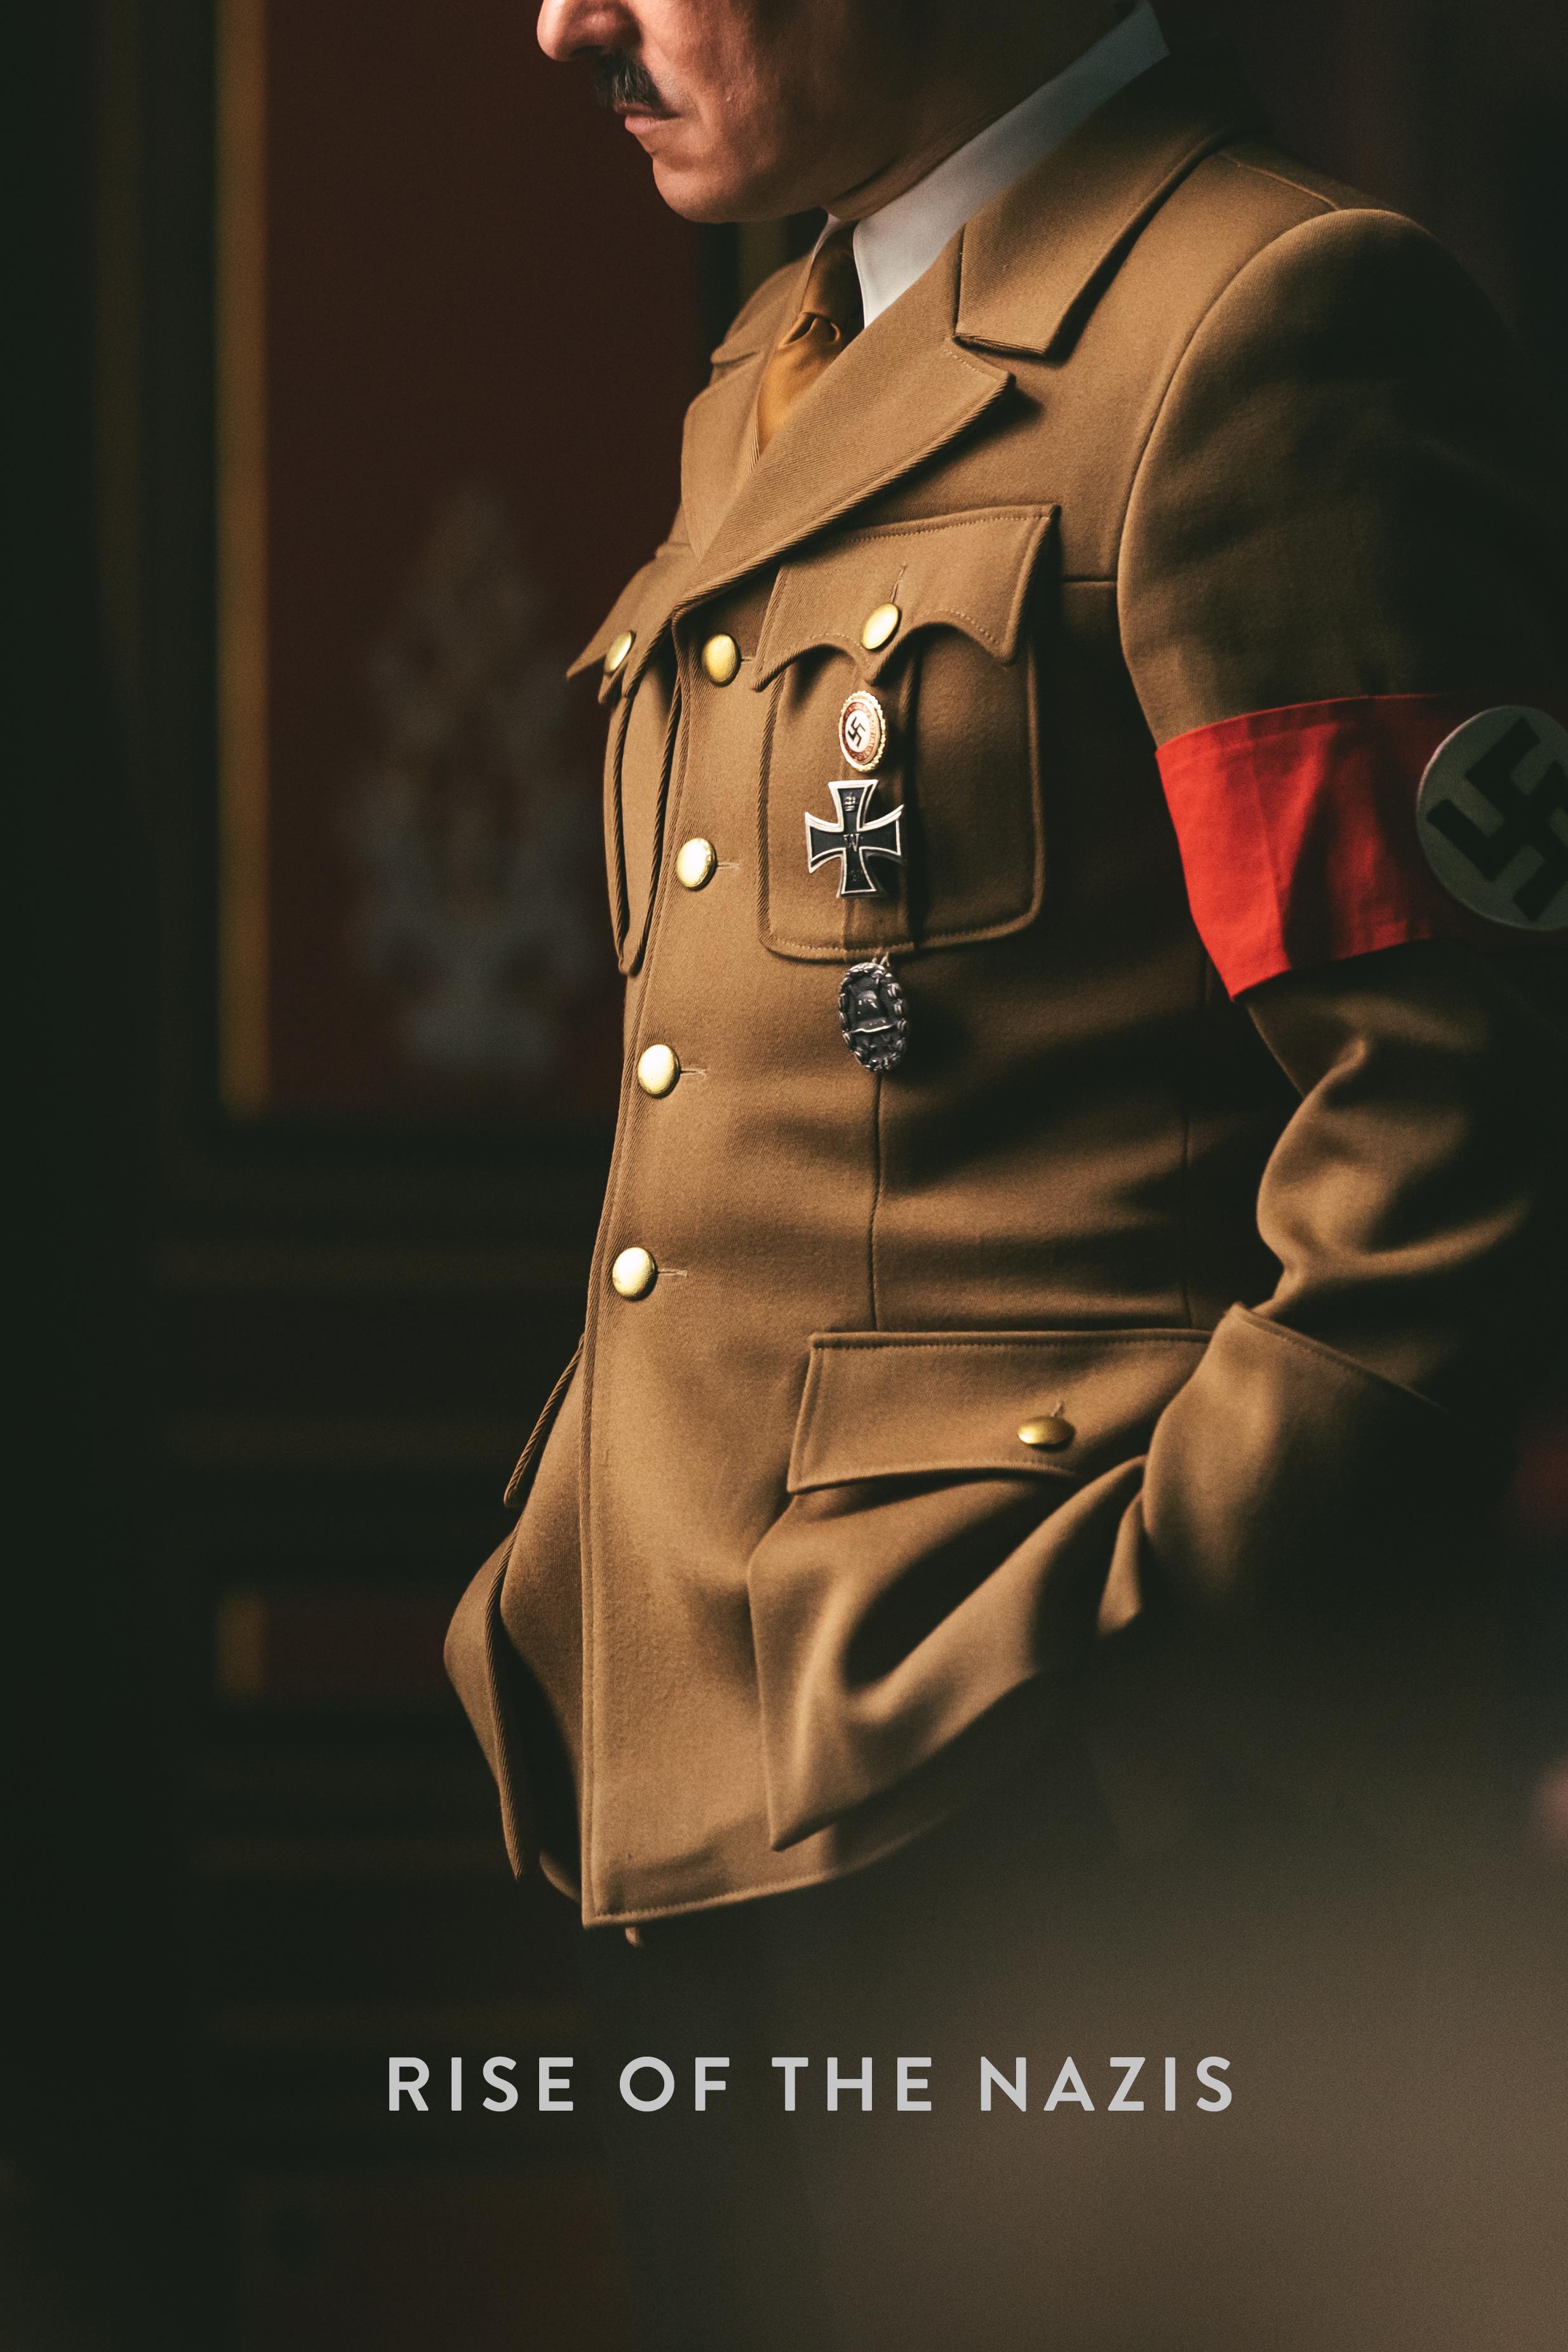 Rise of the Nazis (TV Mini-Series 2019) - IMDb